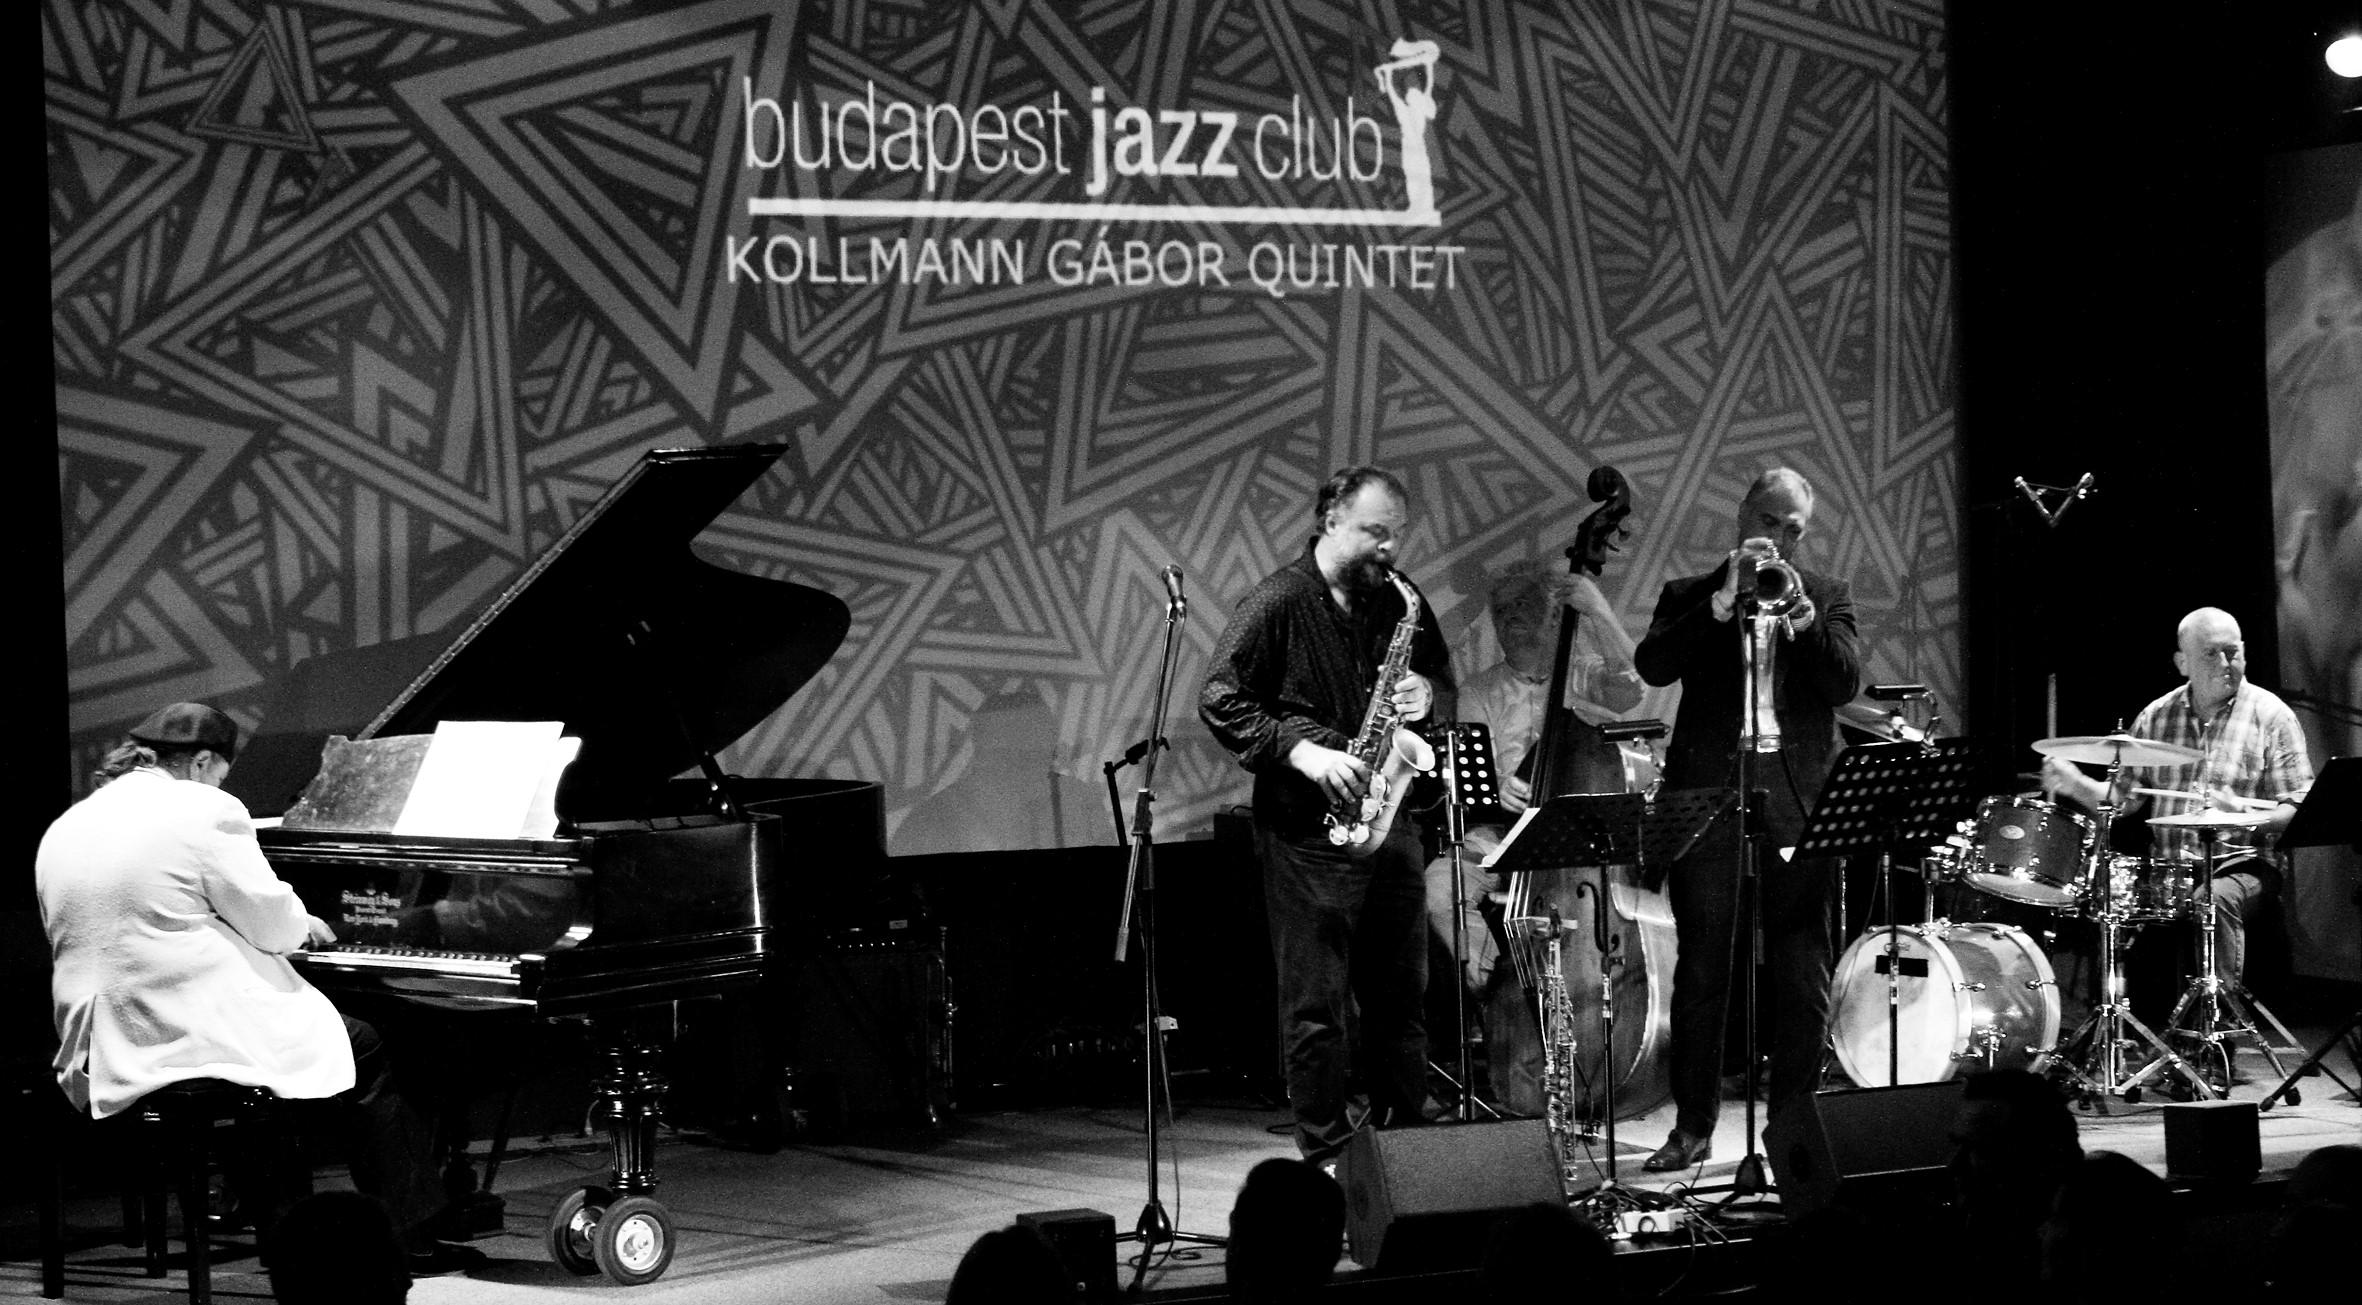 Kollmann Gábor Quintet